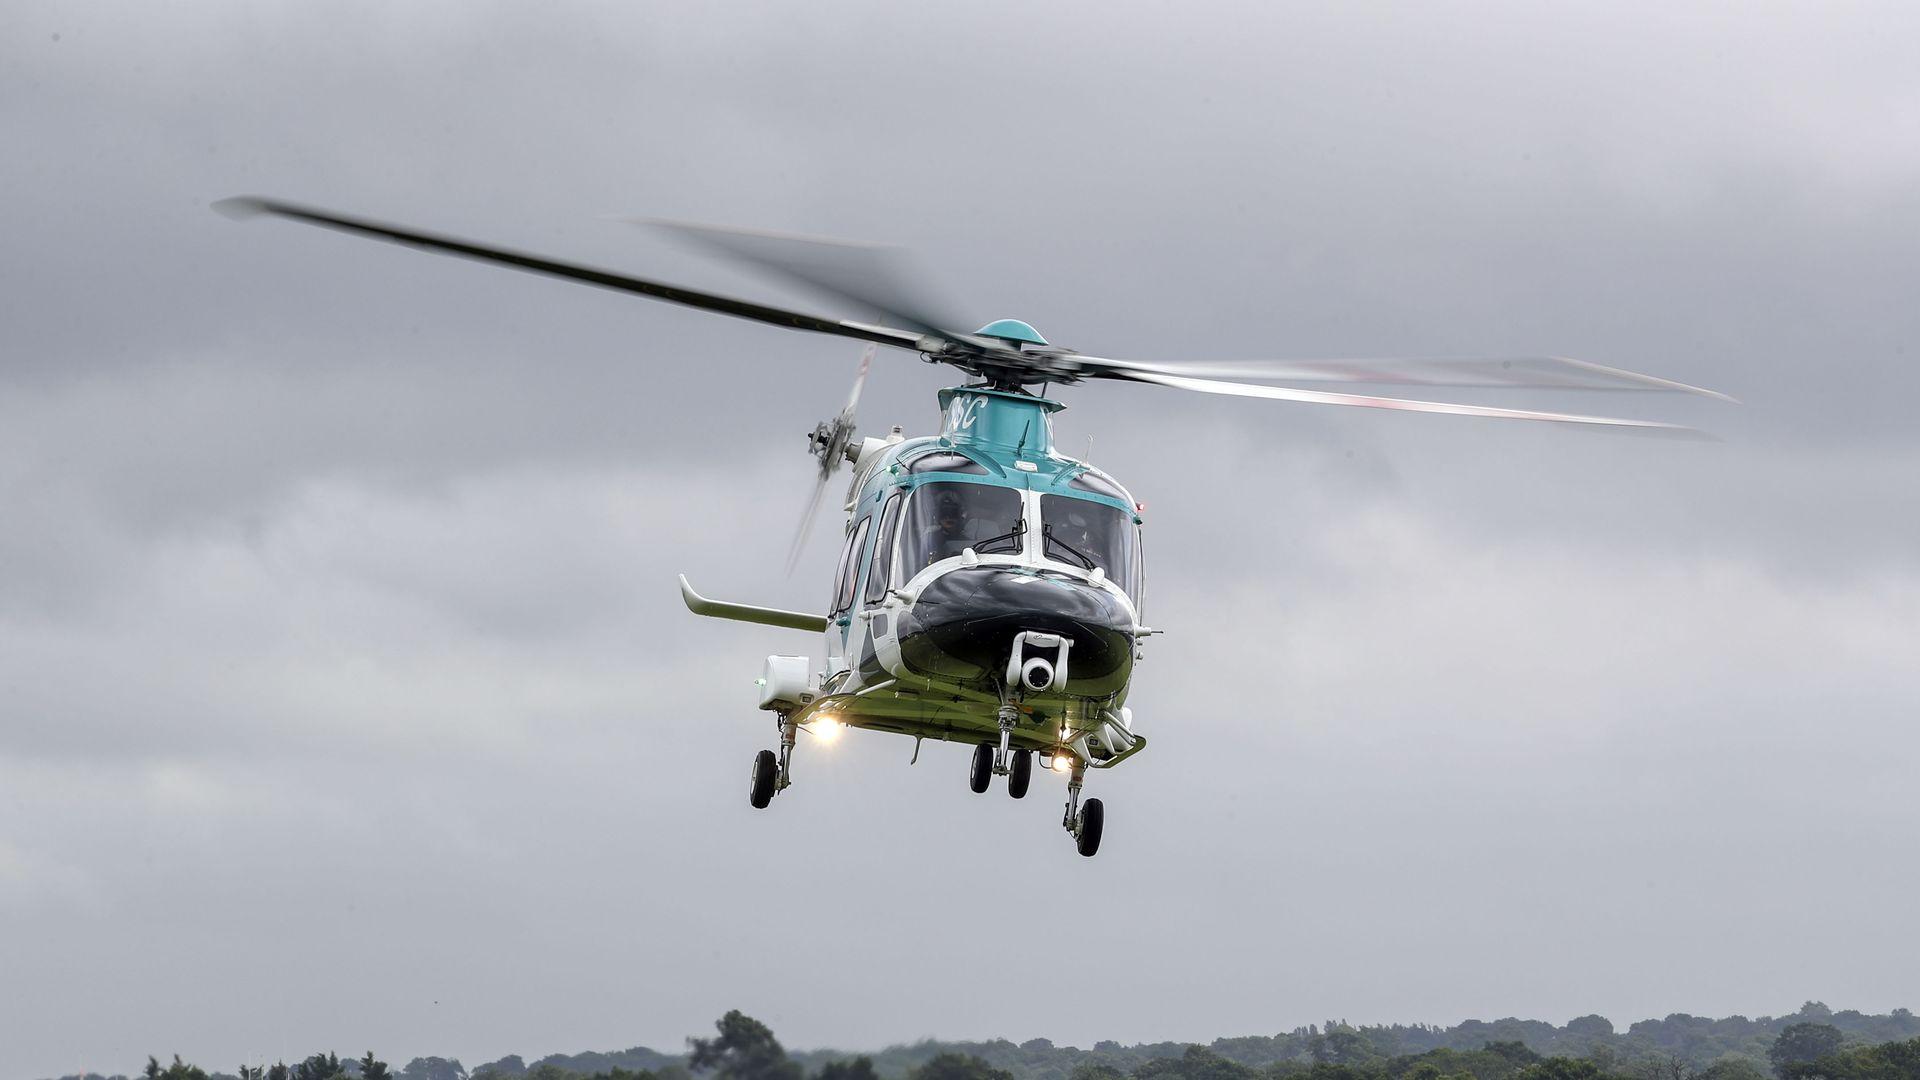 Air ambulance flying